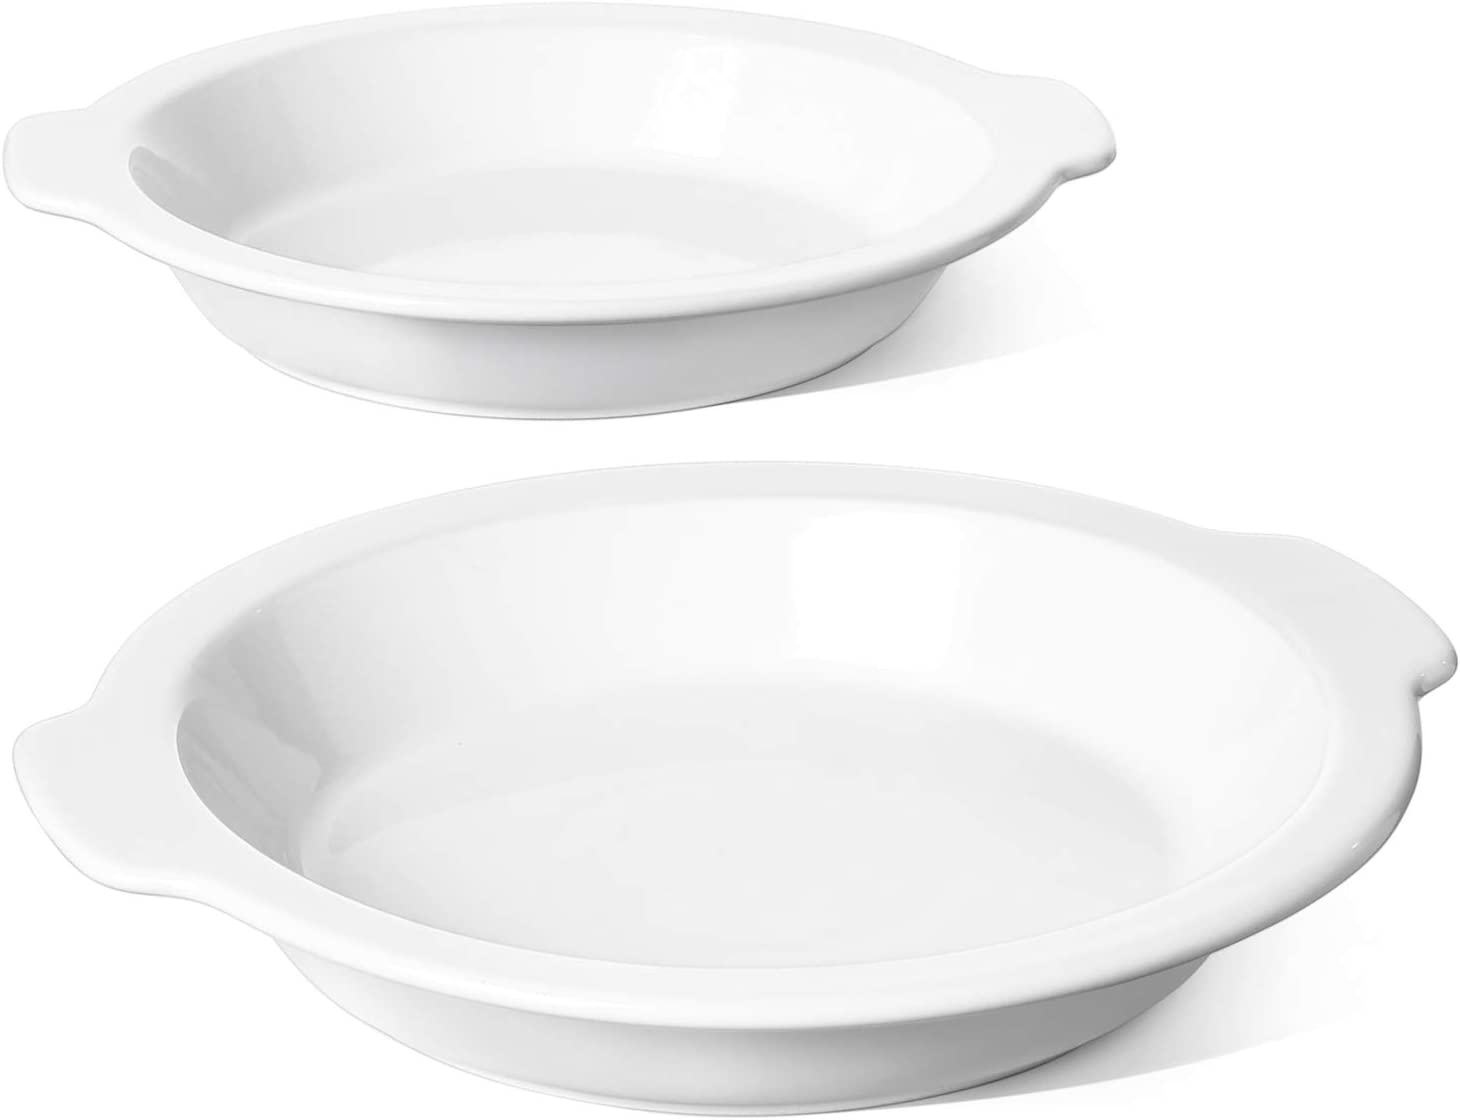 LE TAUCI 9 Inch Pie Pan with Handles, 36 Ounce Pie Plates, Deep Dish Pie Pans For Apple Pie, Pecan Pie, Set of 2, White